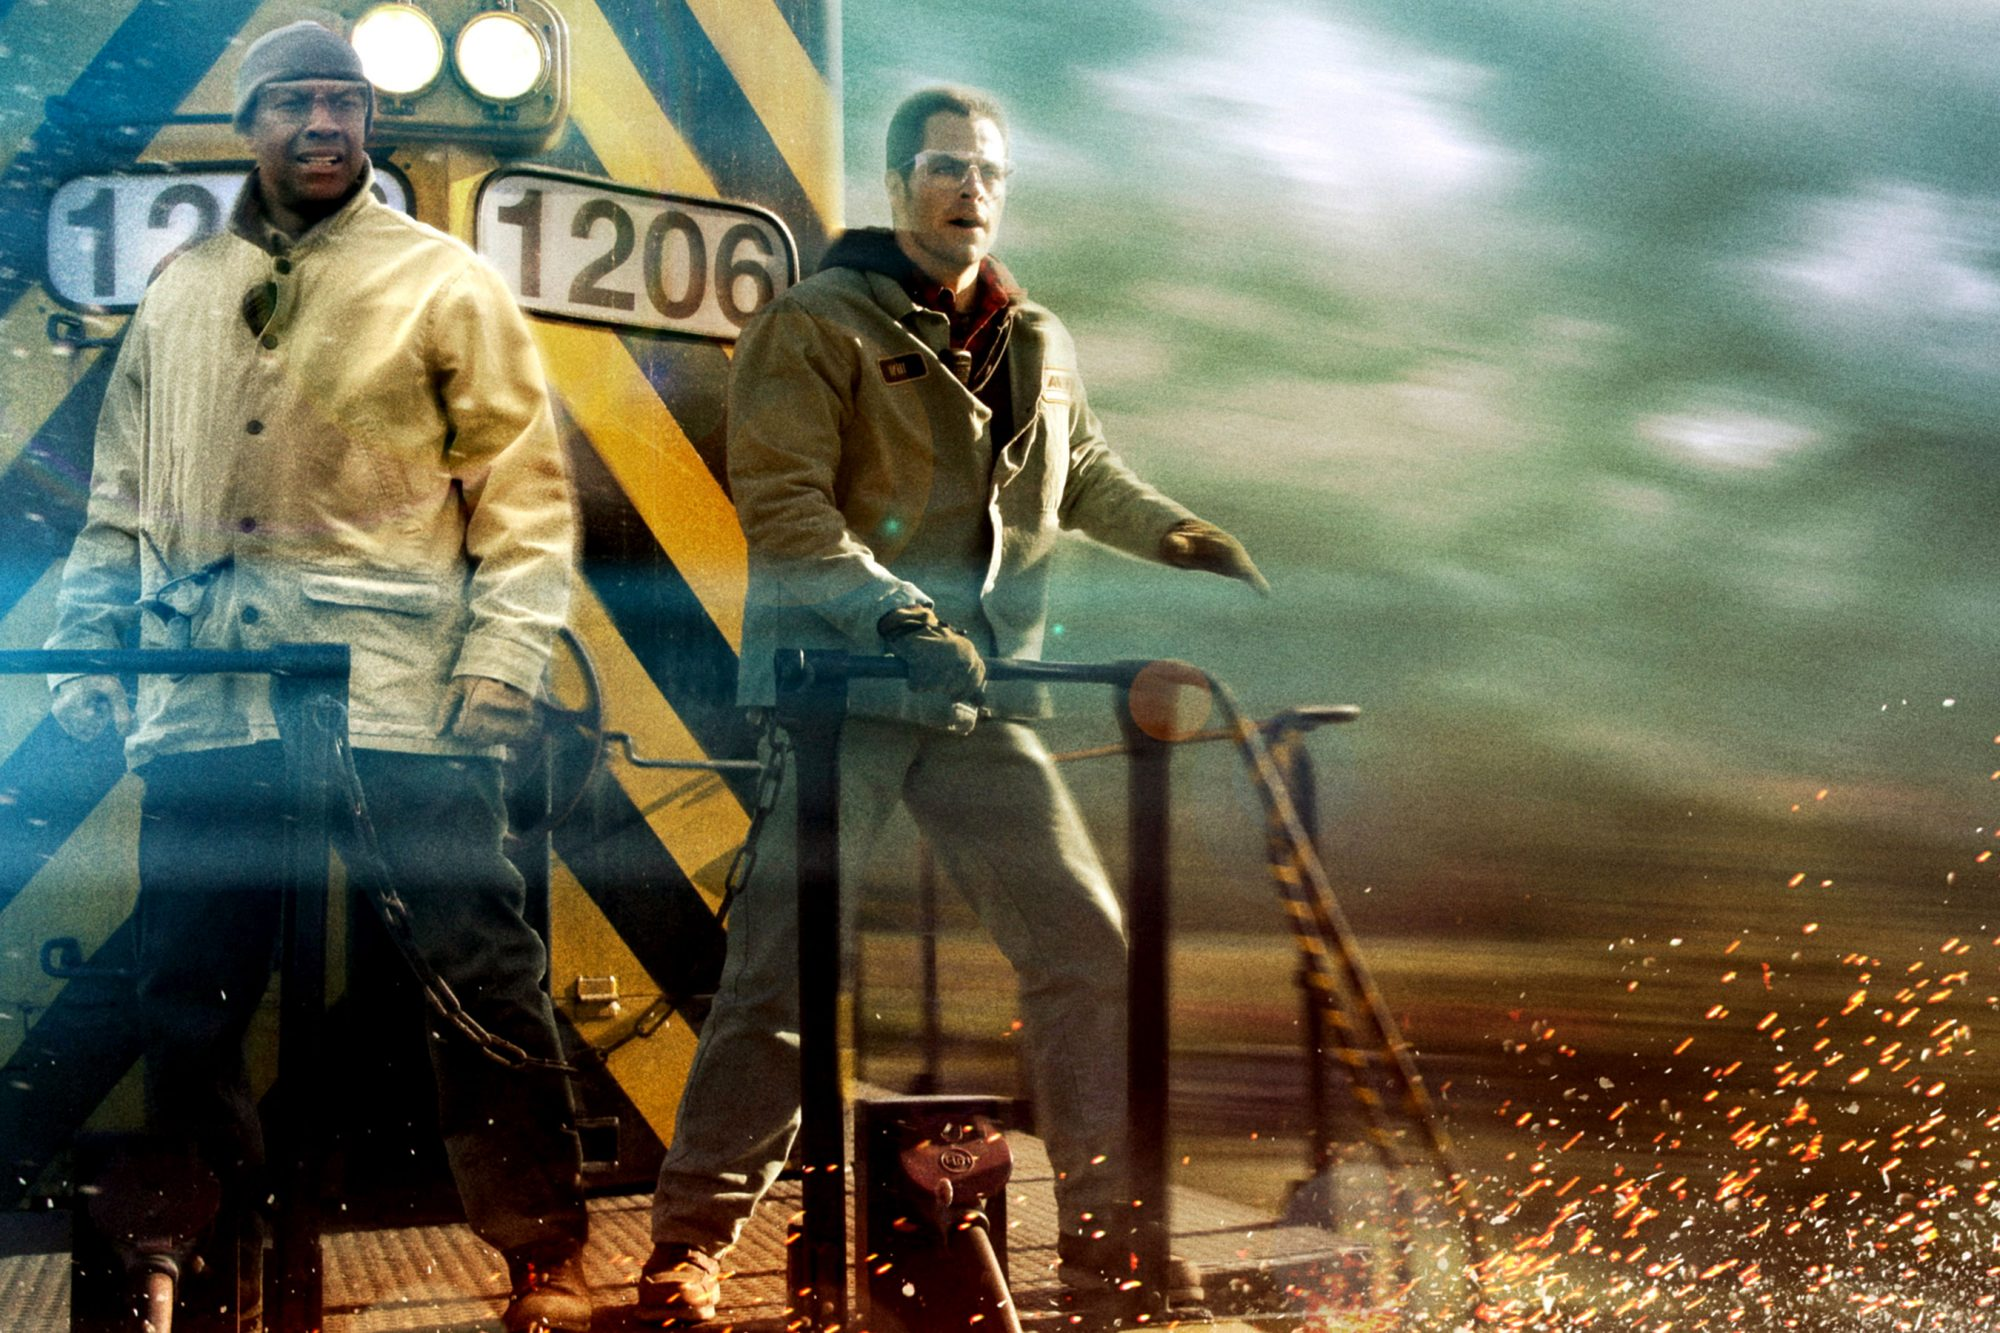 UNSTOPPABLE, l-r: Denzel Washington, Chris Pine, 2010, ph: Robert Zuckerman/TM and Copyright ©20th C